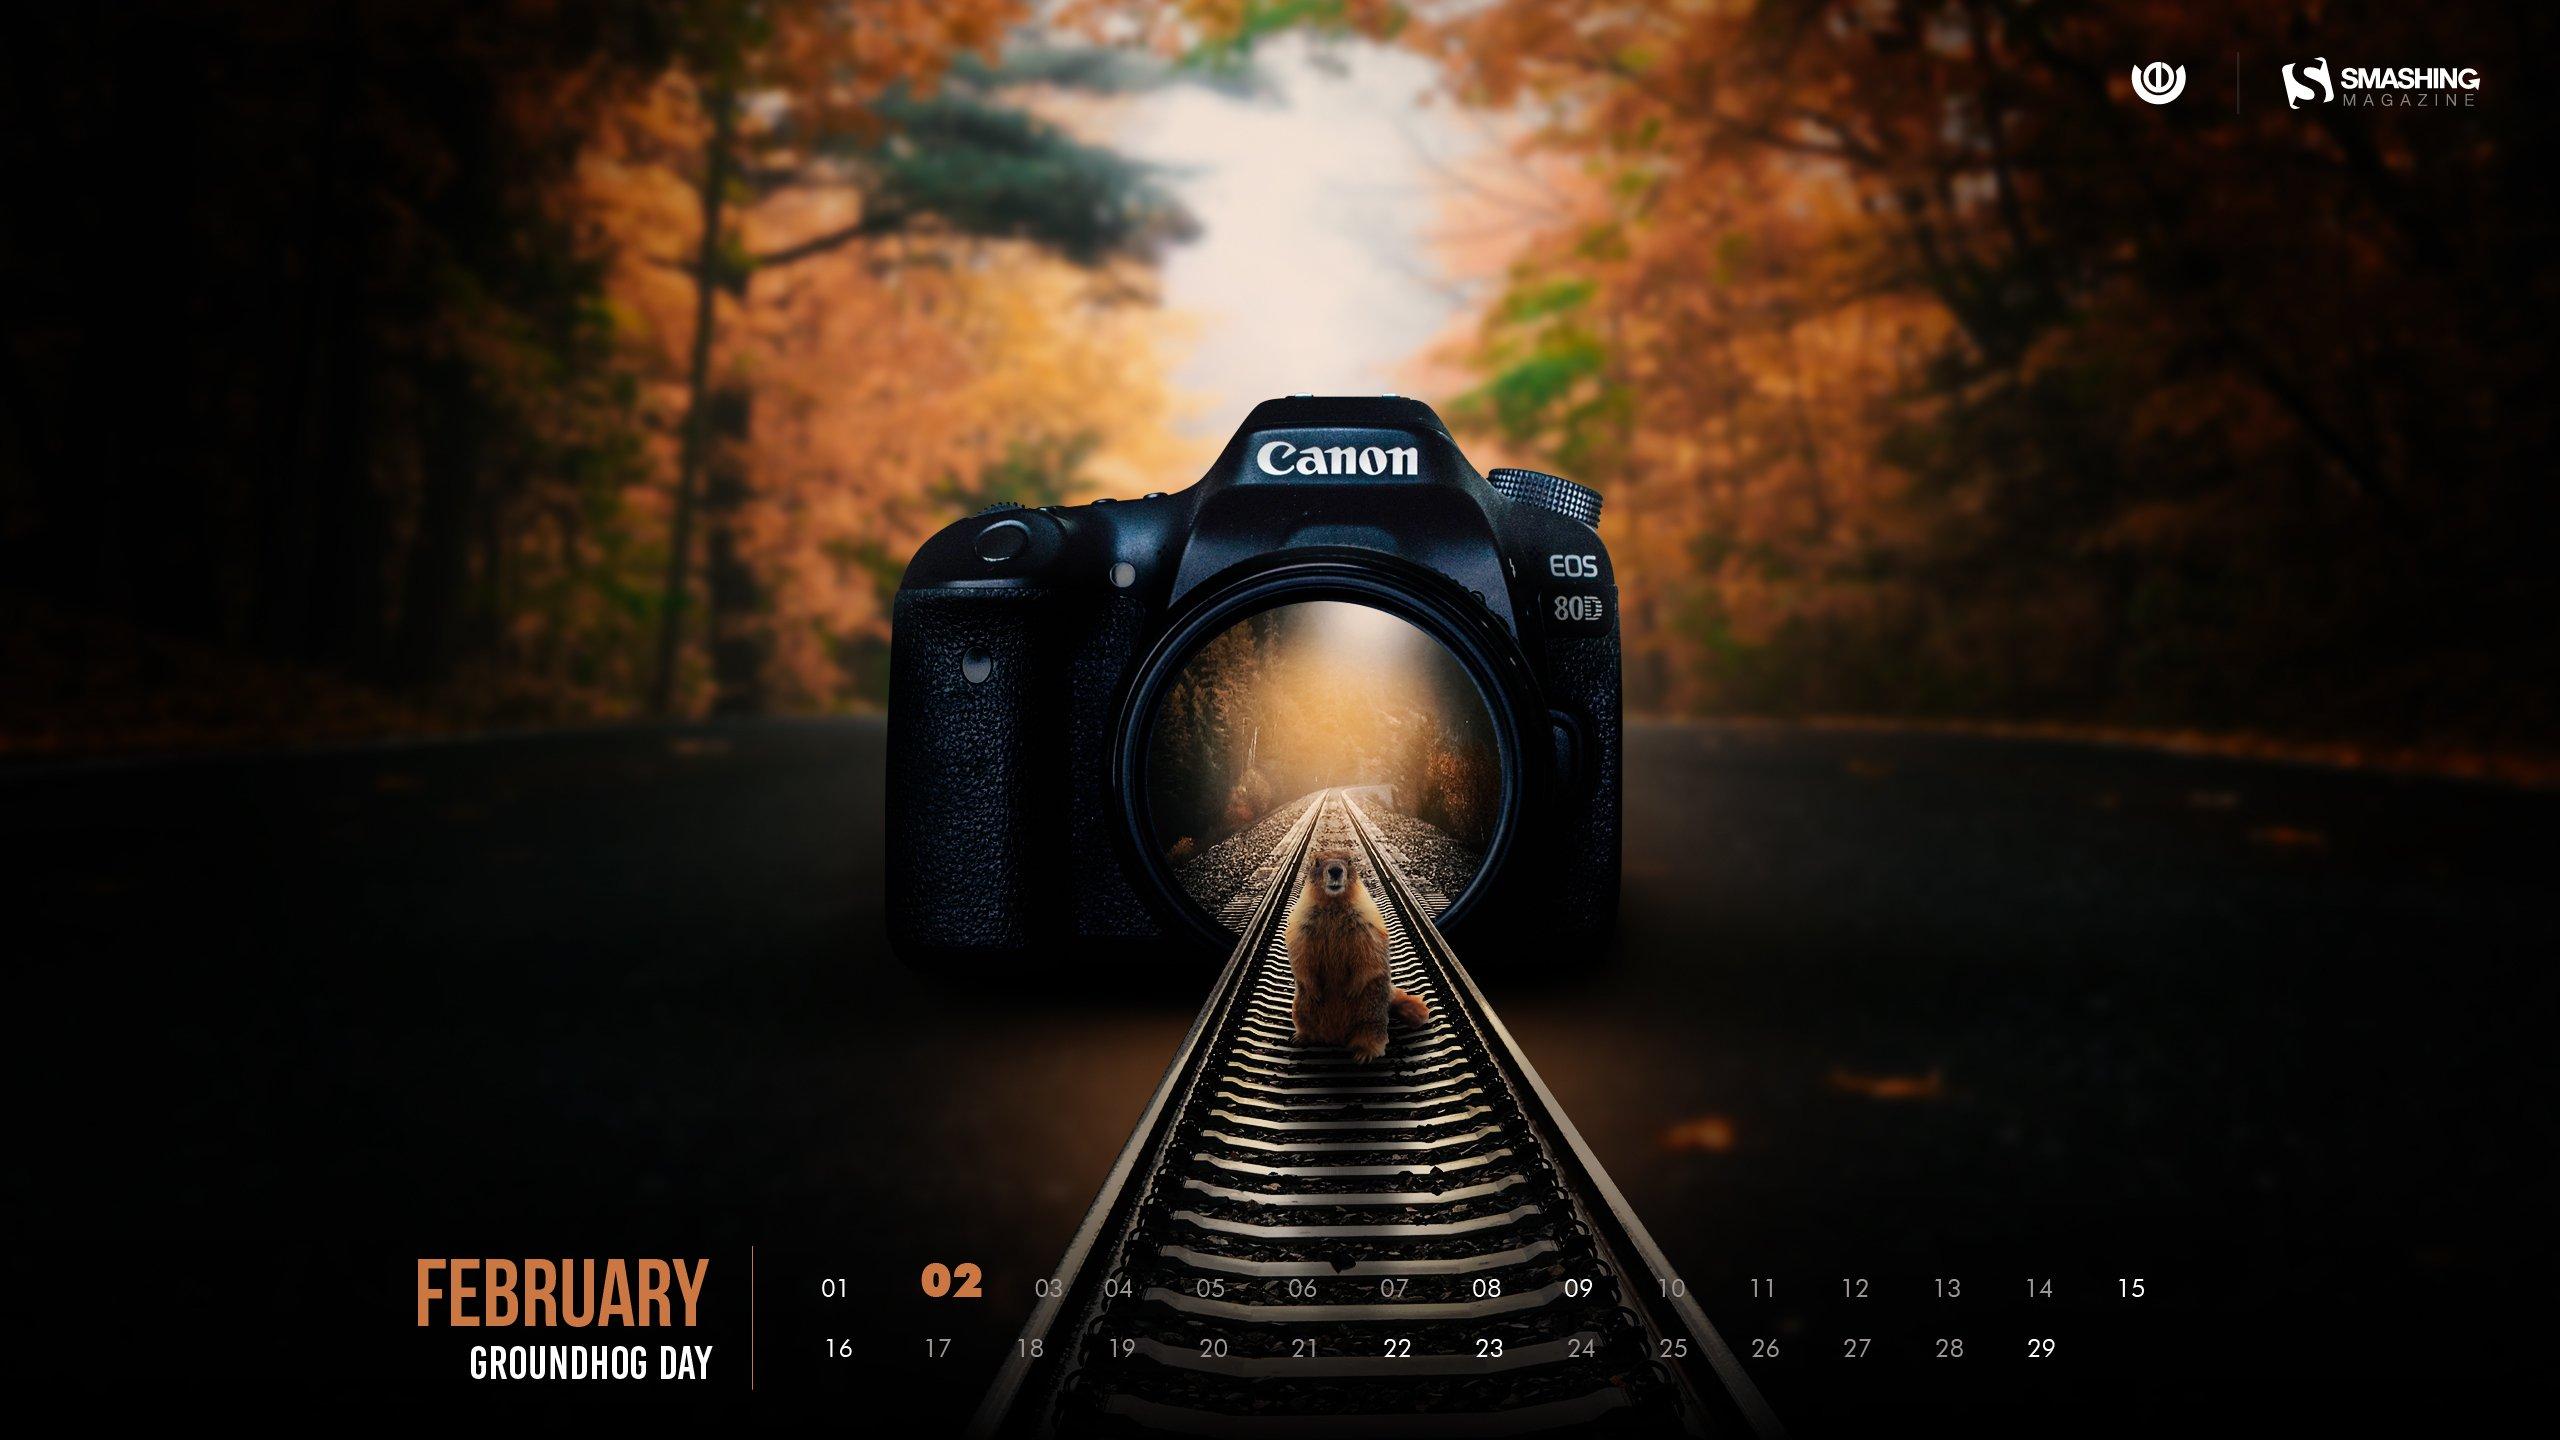 29 Days Of February 2020 Wallpapers Edition Smashing Magazine 2560x1440